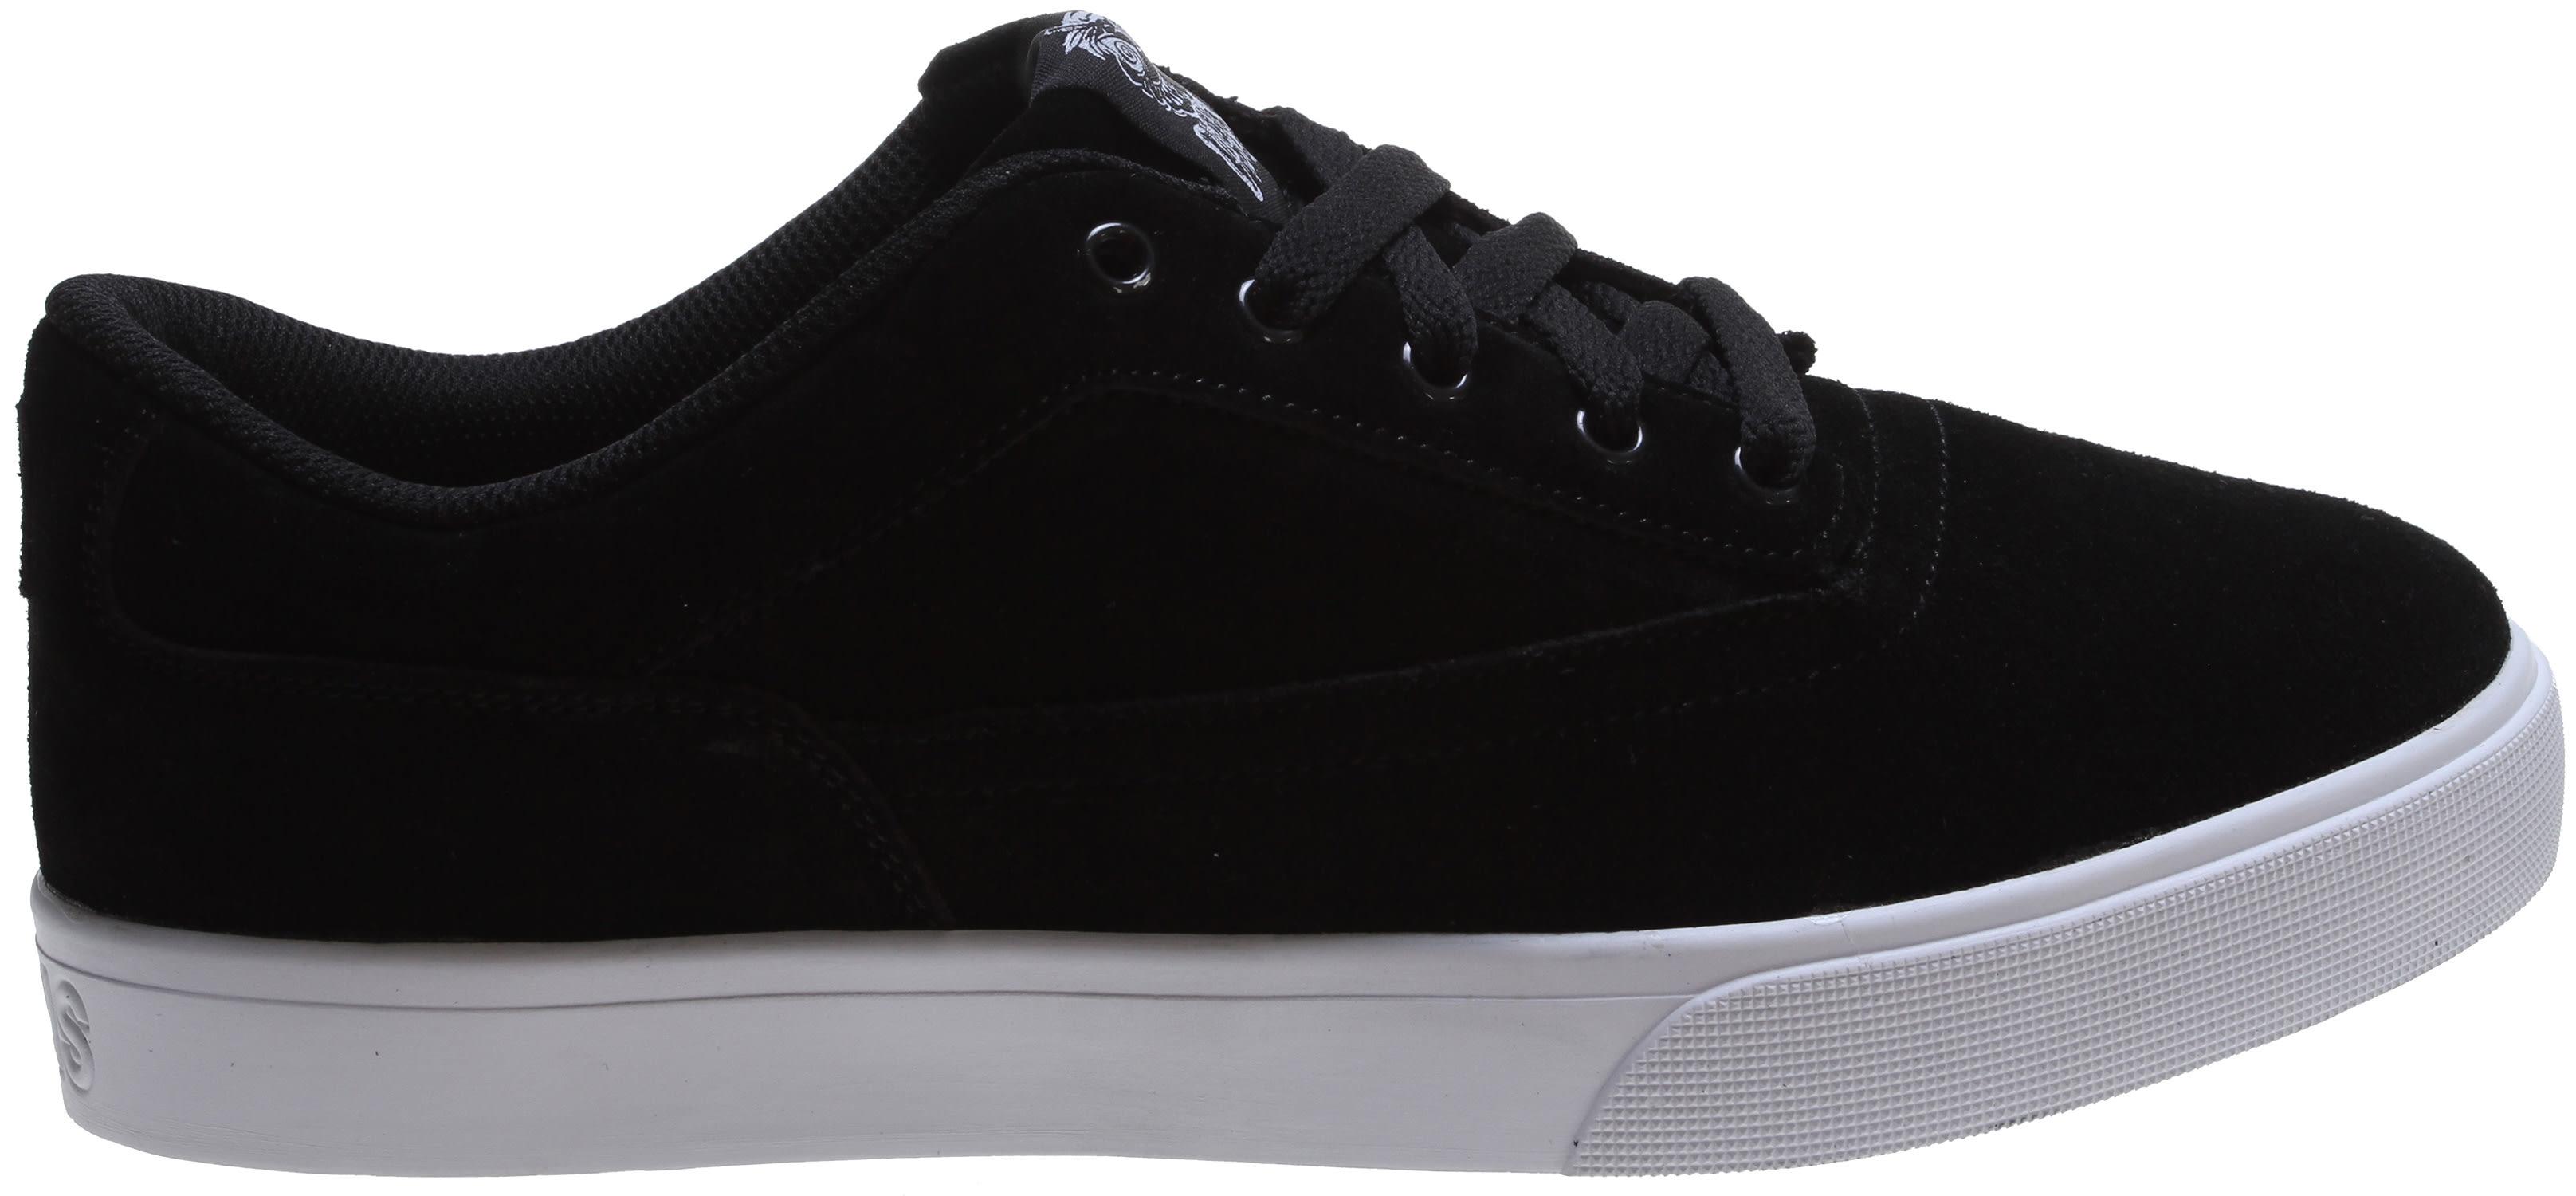 Osiris Caswell VLC Skate Shoes - thumbnail 1